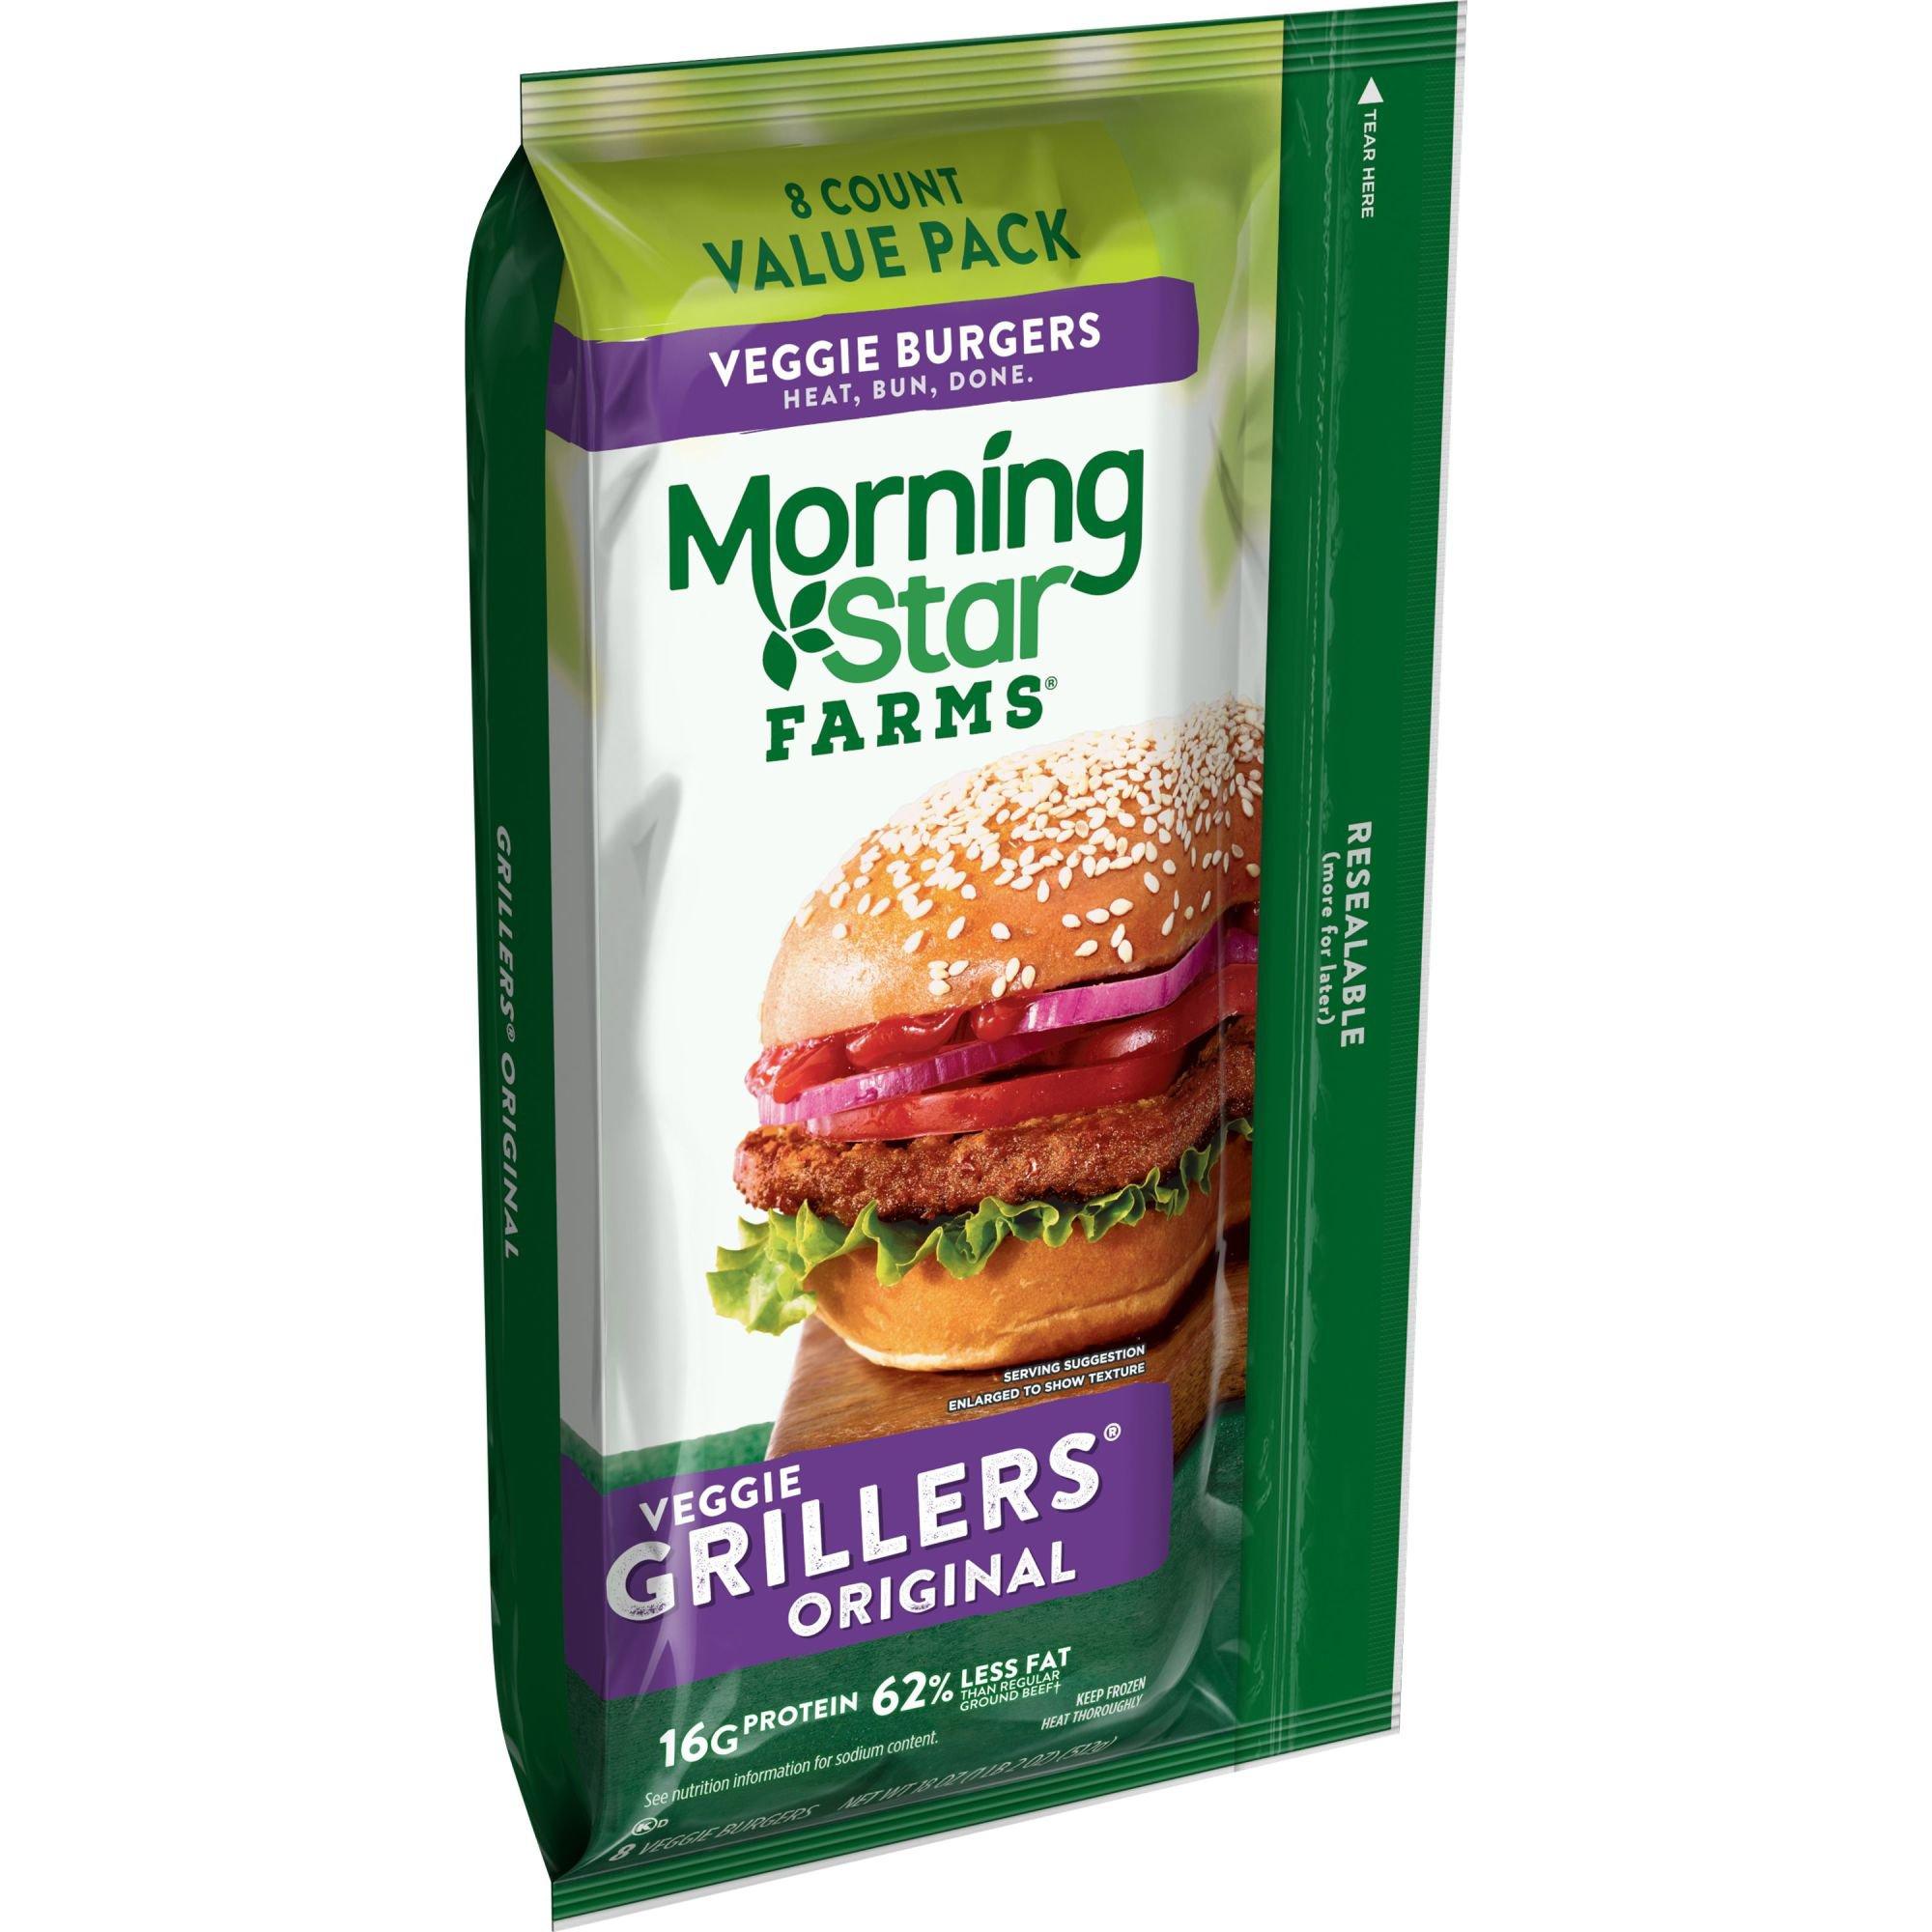 Morningstar Farms Grillers Original Veggie Burgers Value Pack Shop Meat Alternatives At H E B